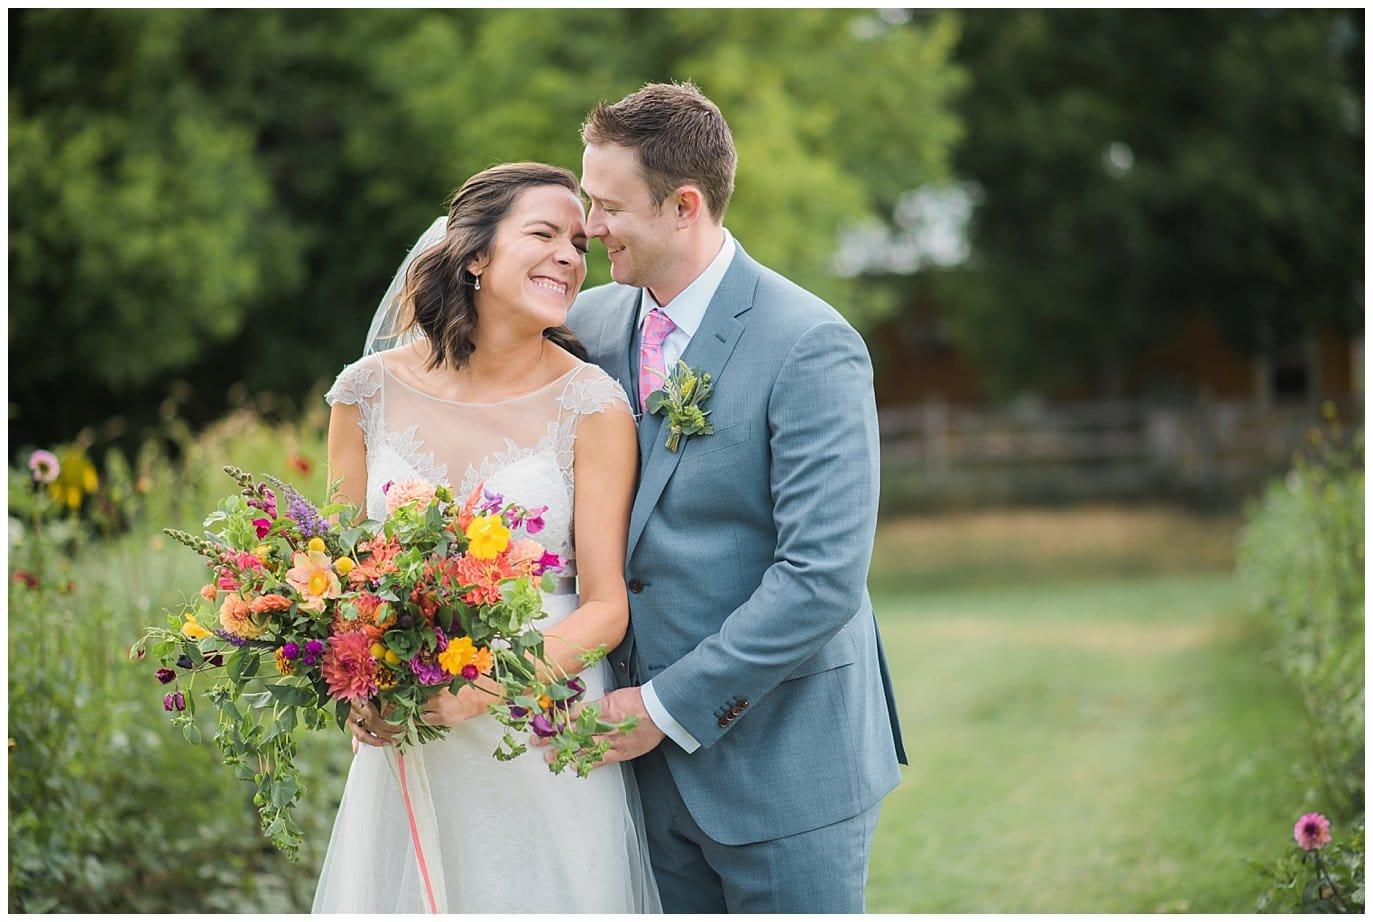 Colorful Colorado farm wedding photo